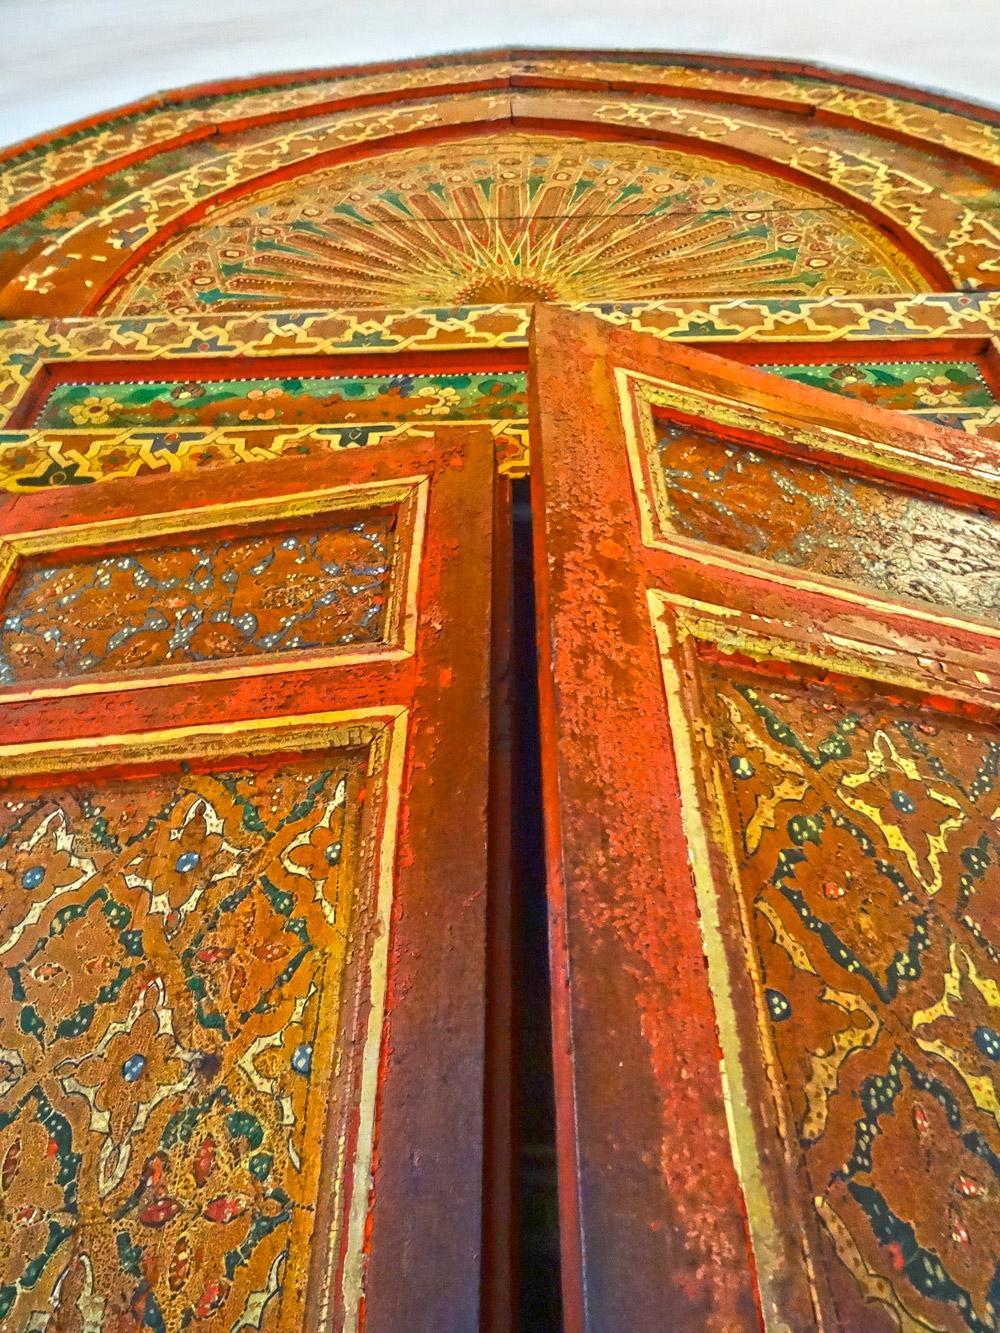 Porte de placard Palais de la bahia.